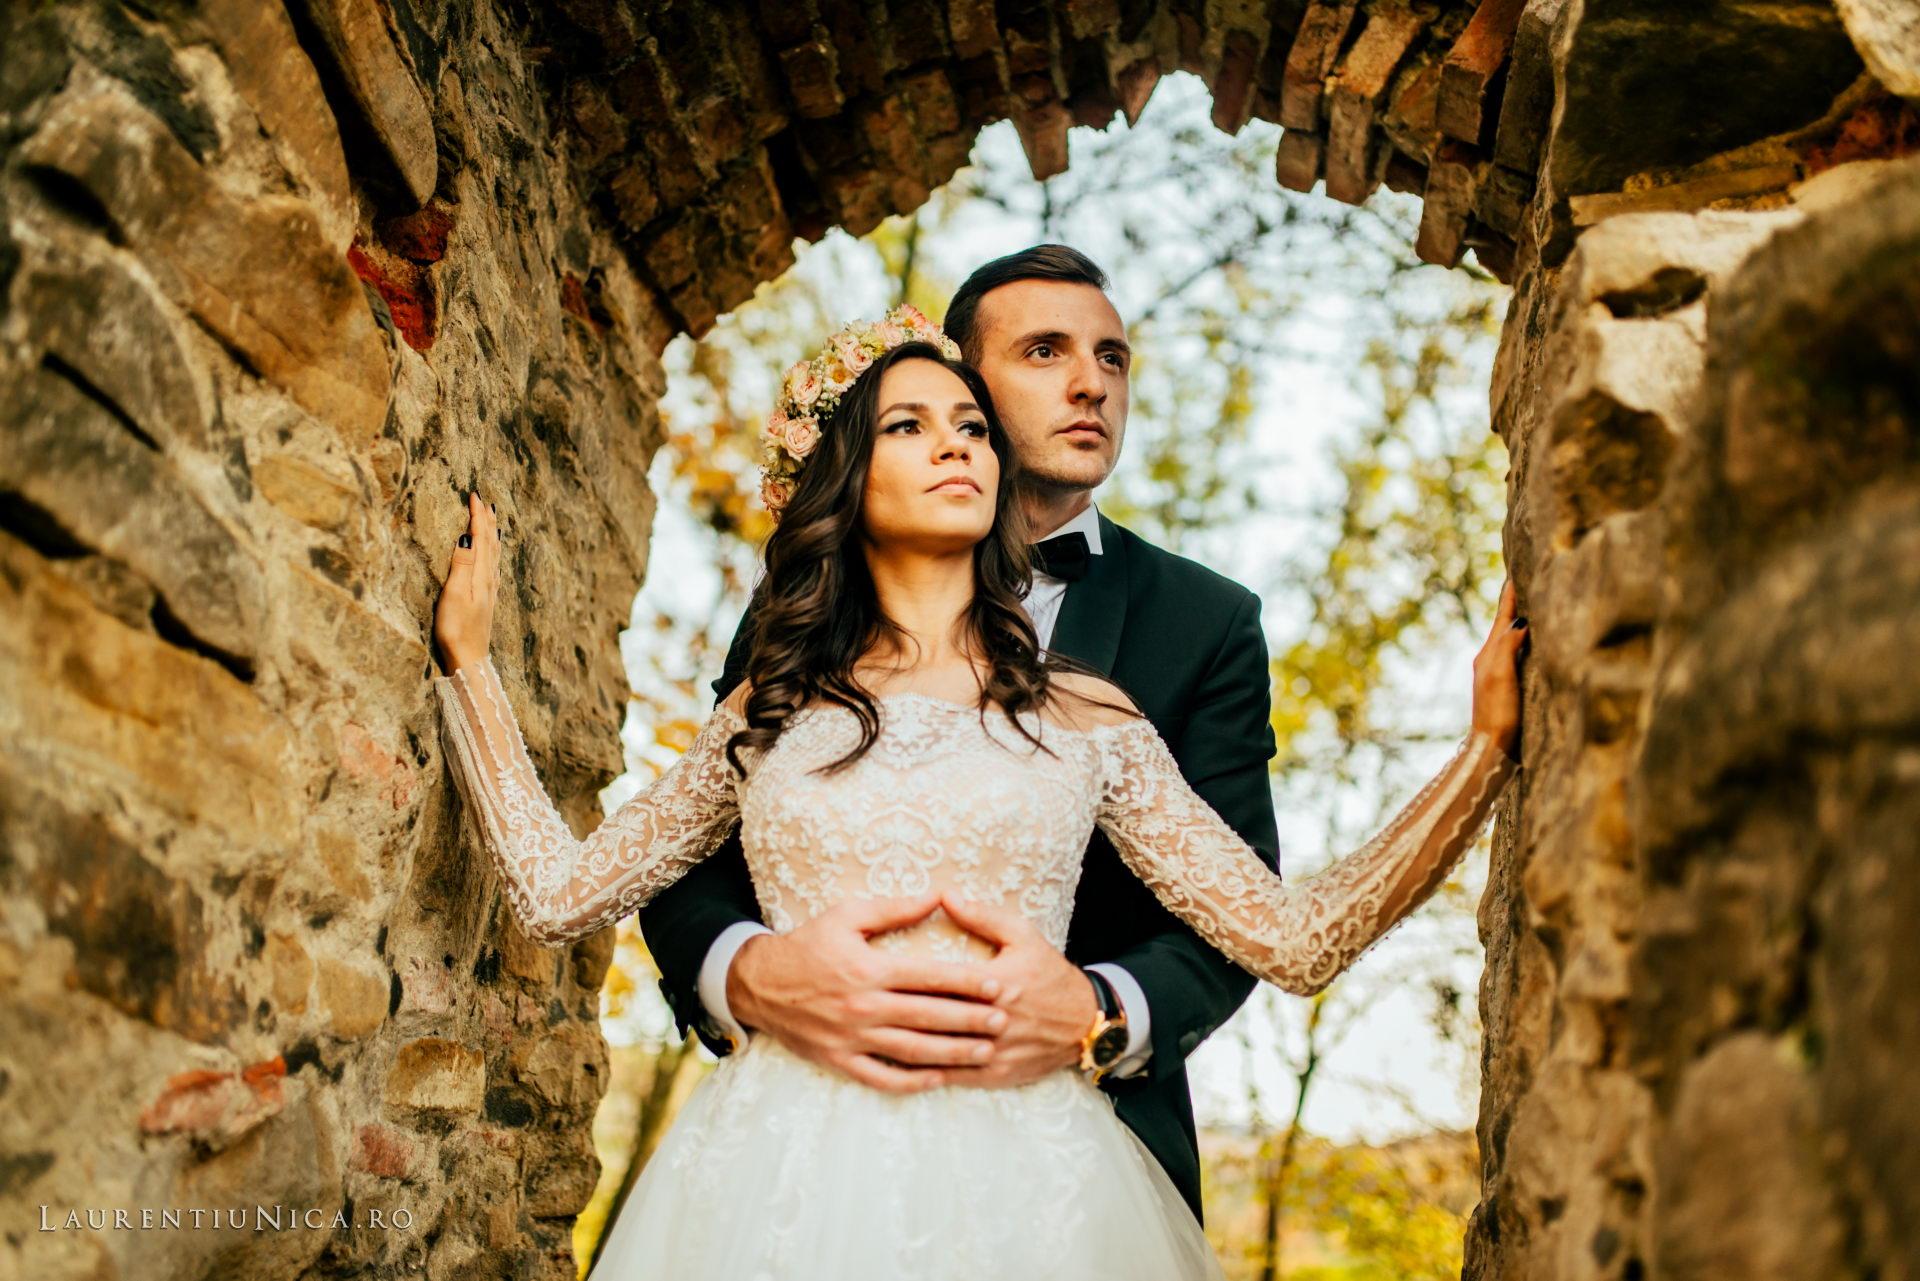 lili-si-dan-fotografii-nunta-after-wedding-sighisoara-laurentiu-nica24